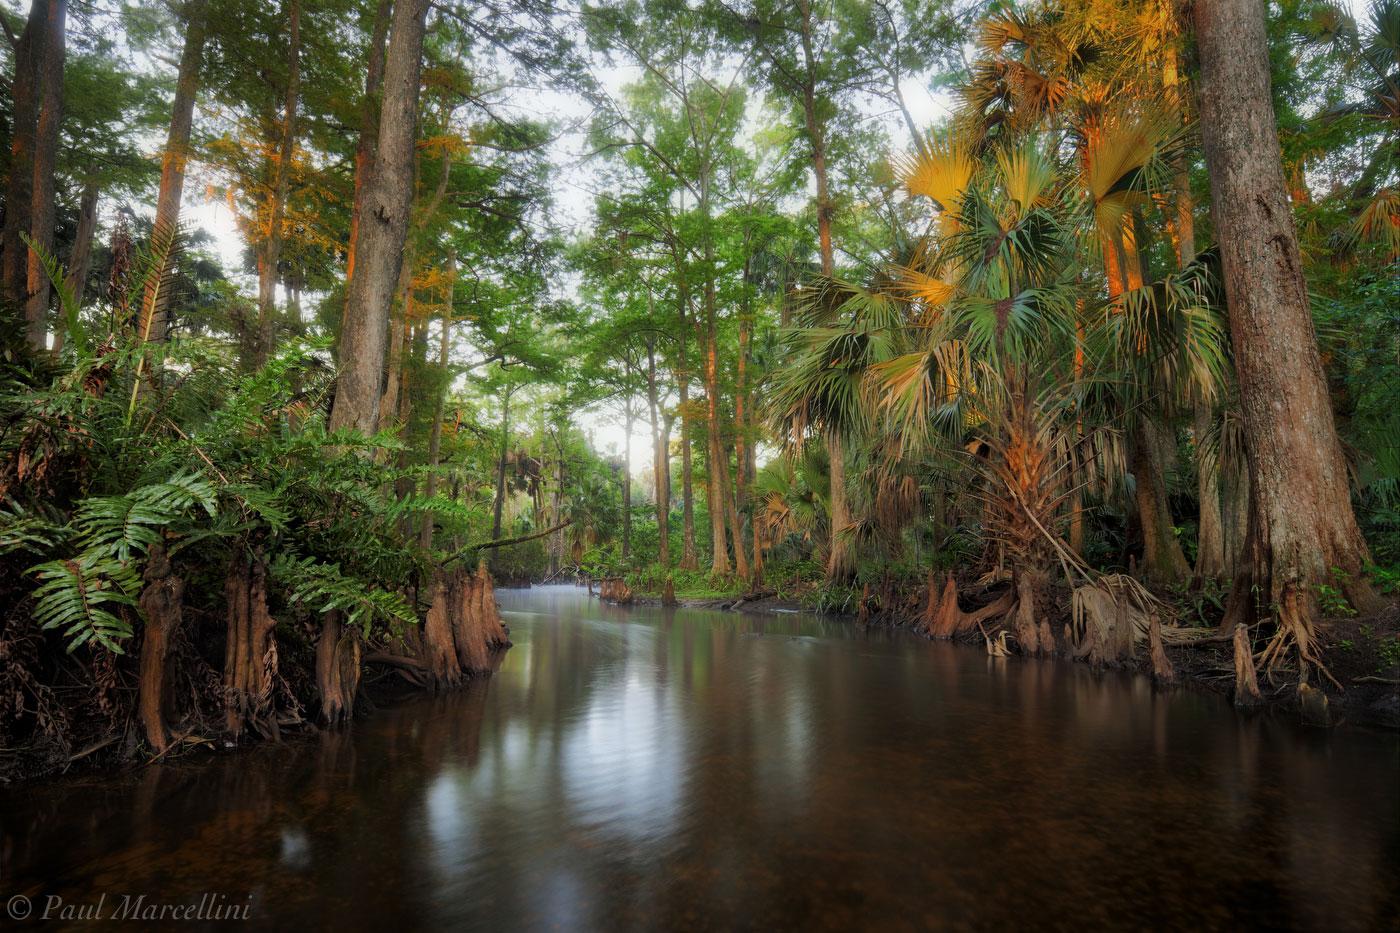 Loxahatchee River, Florida, morning, south florida, jupiter, nature, photography, photo